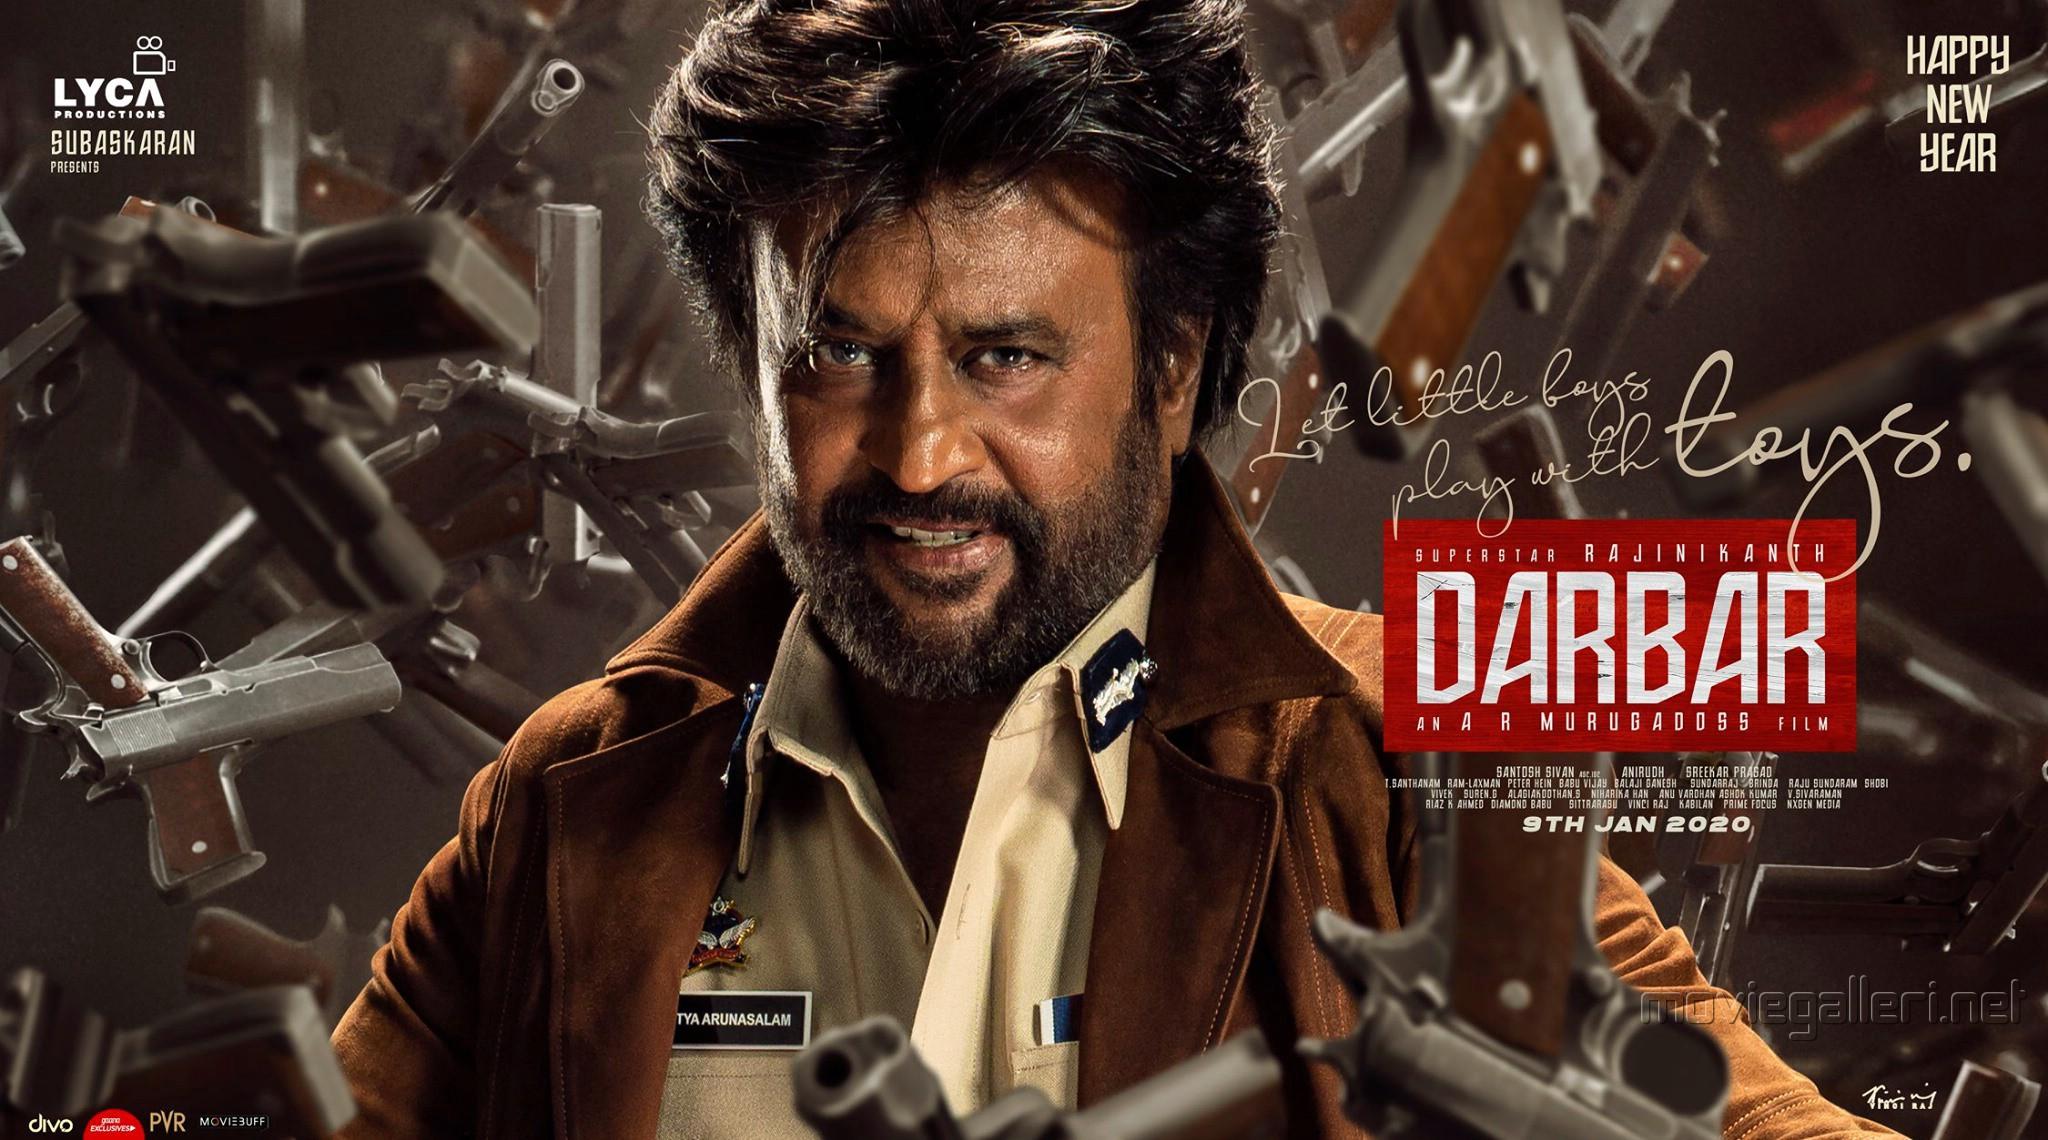 Rajinikanth Darbar Movie New Year 2020 Wishes Posters HD 311e1aa